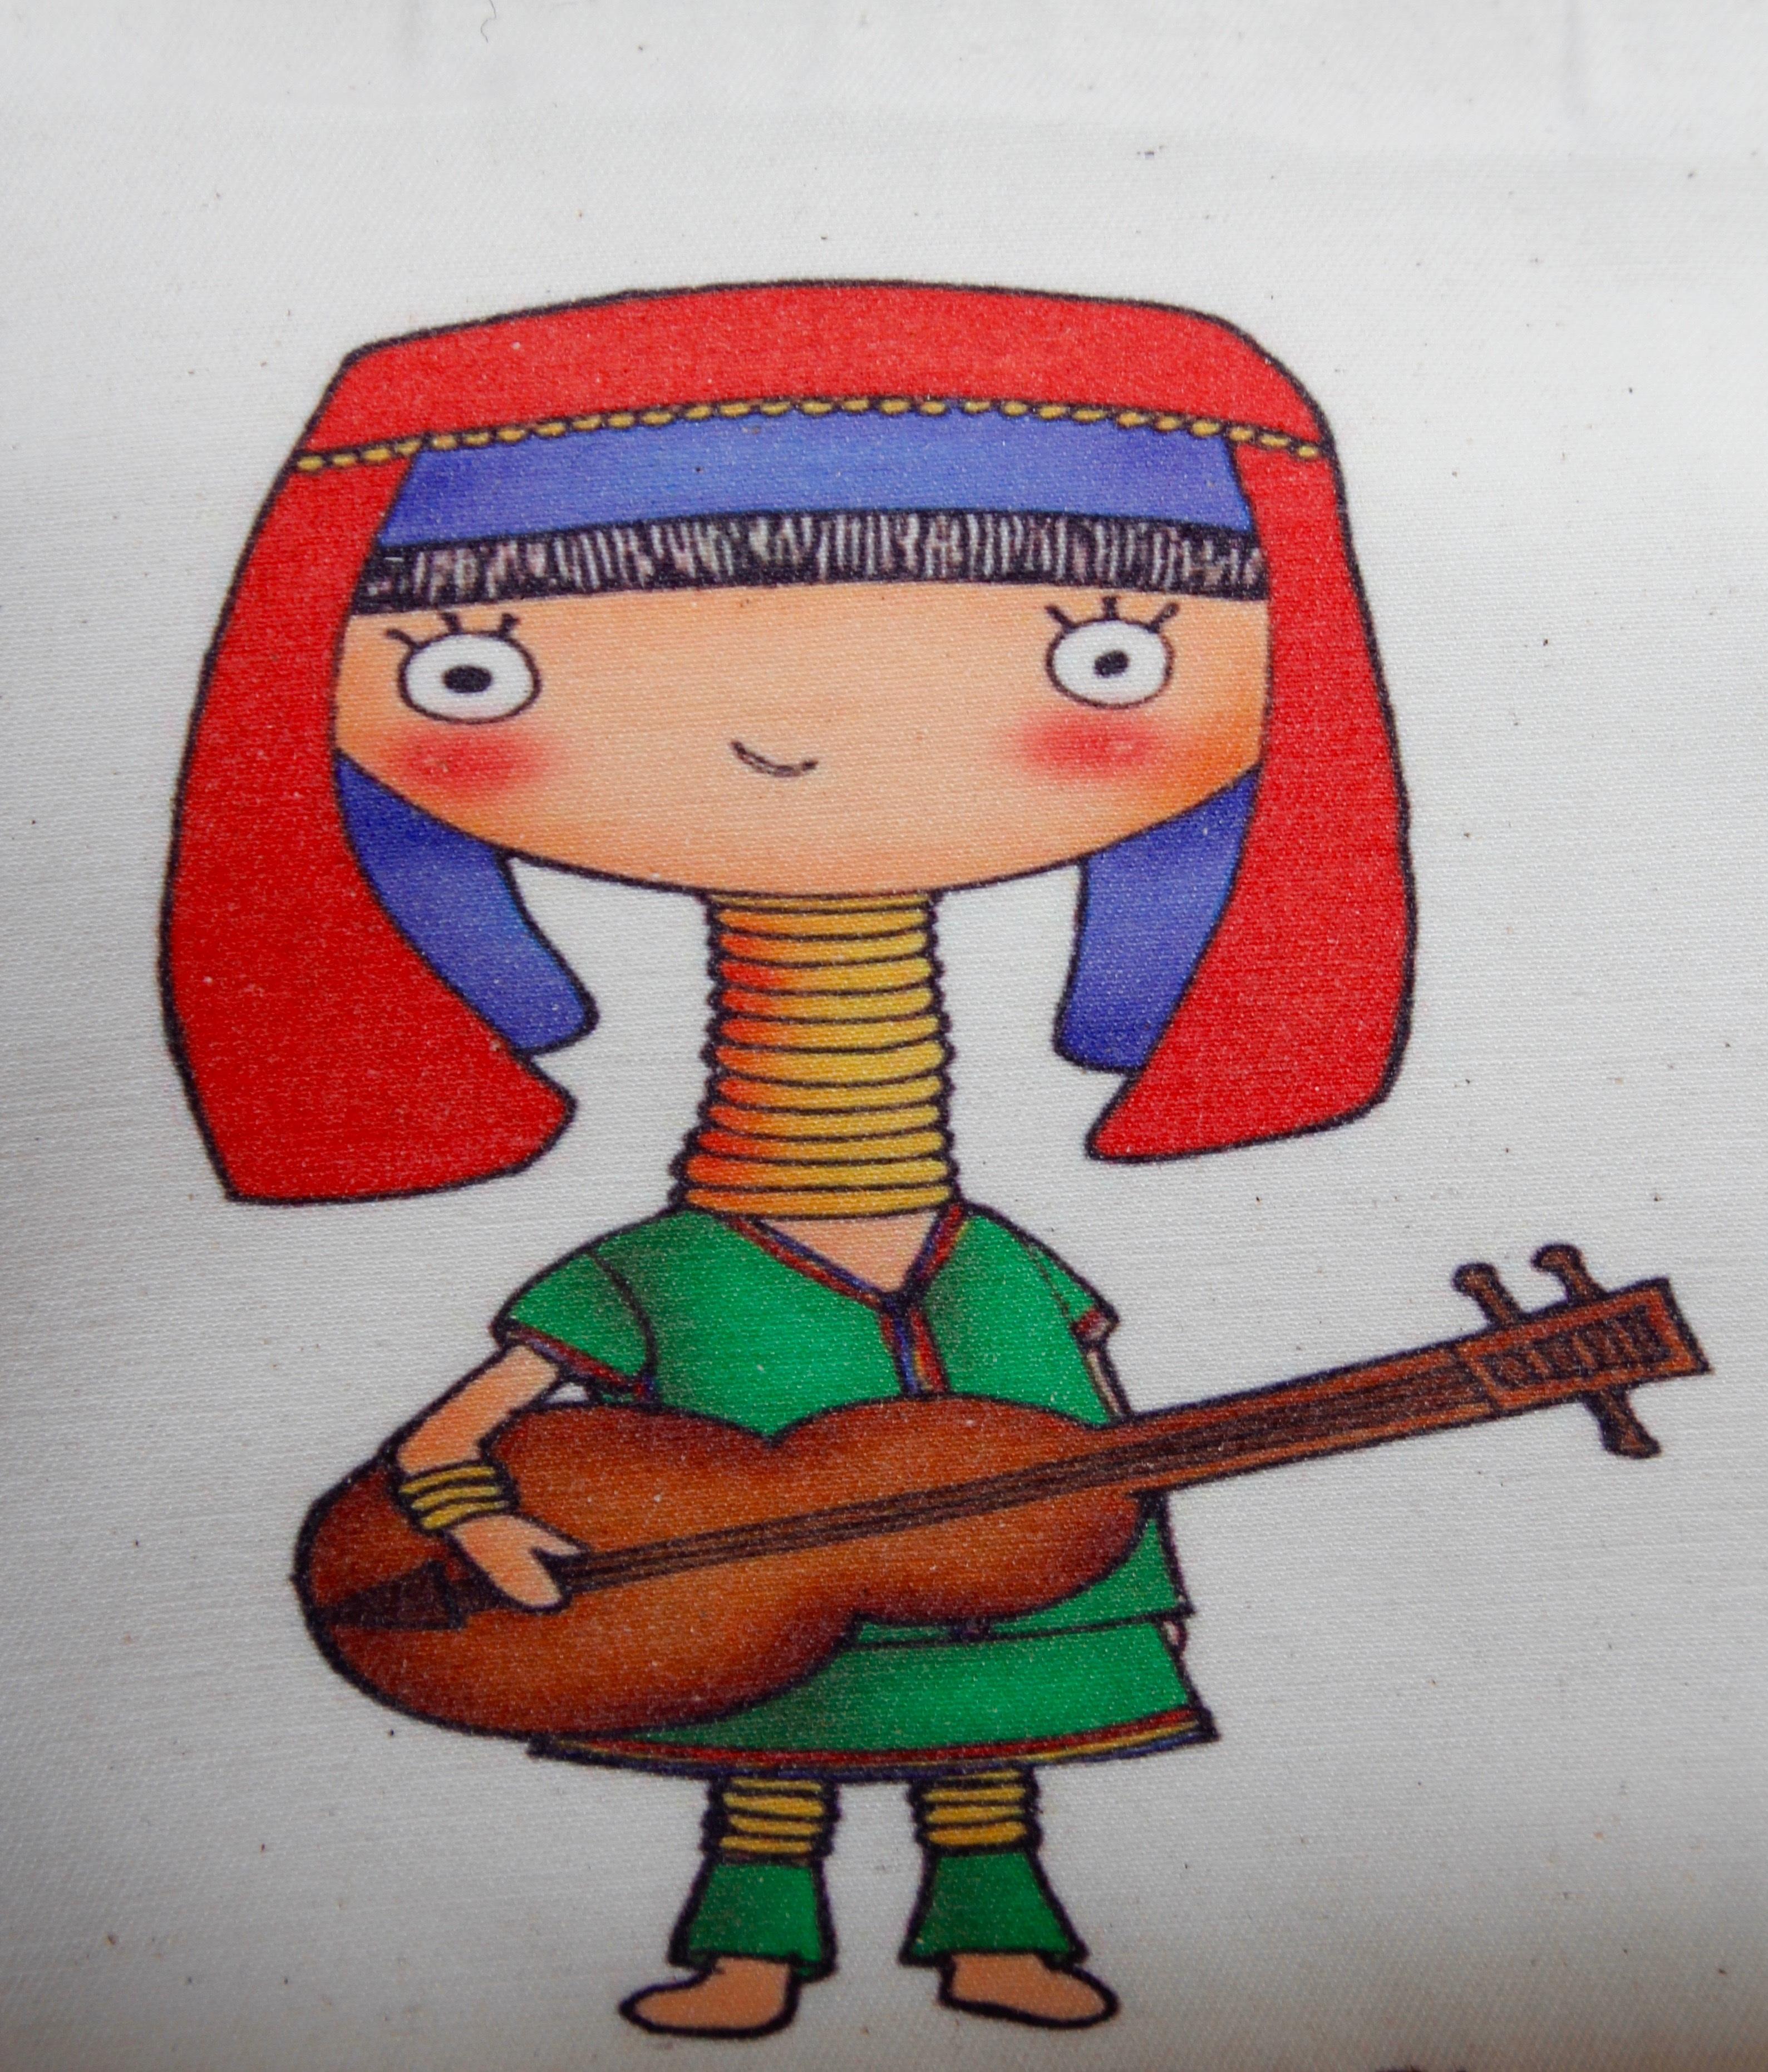 Gambar Gadis Gitar Merah Warna Instrumen Mahasiswa Mainan